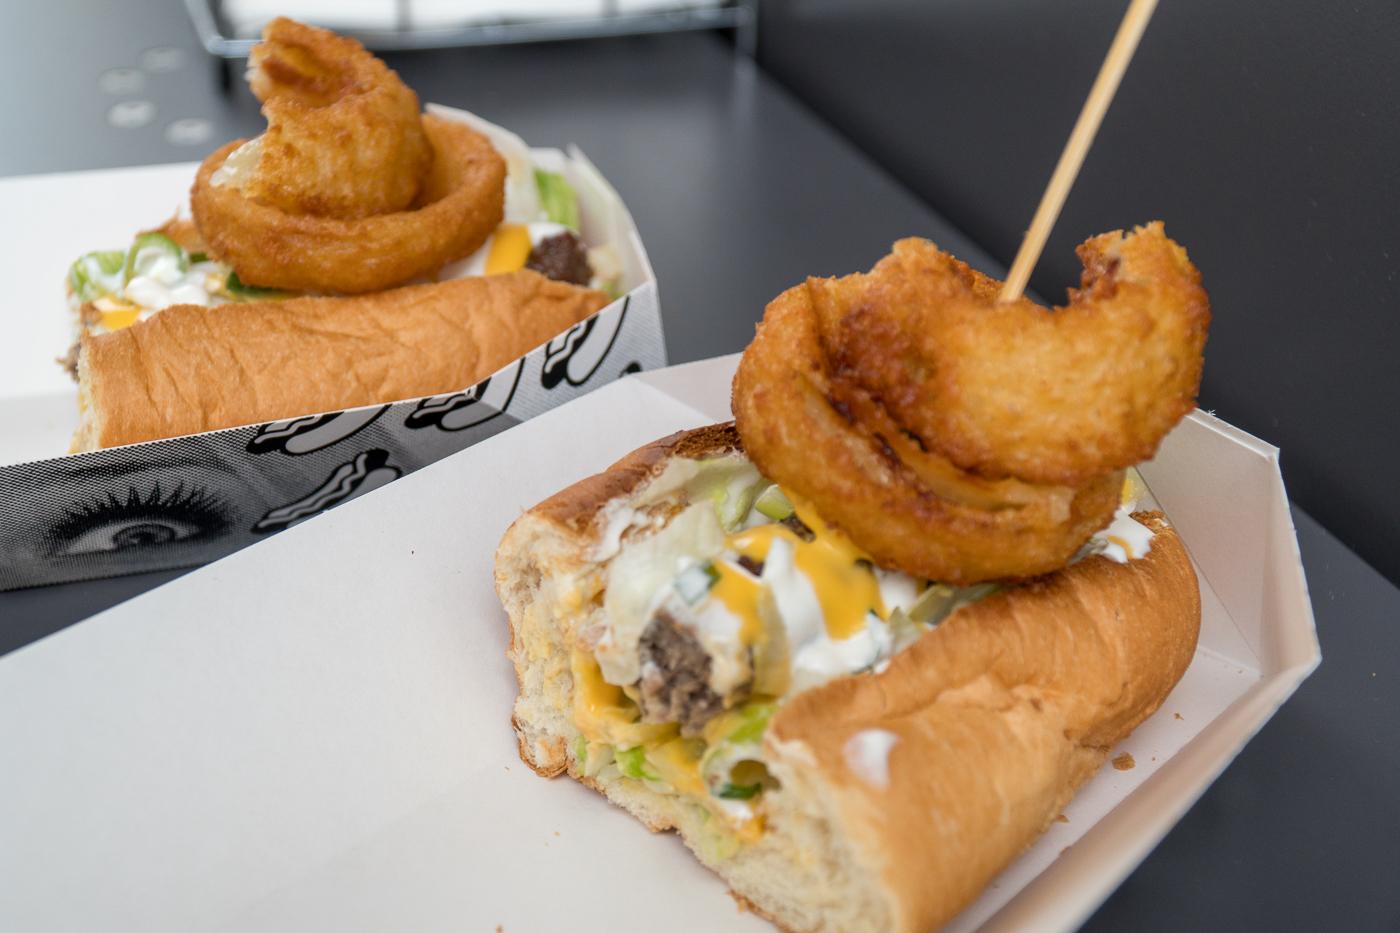 Hot dog gourmand du Oh My Dog, un kiosque de street food à Graz en Autriche